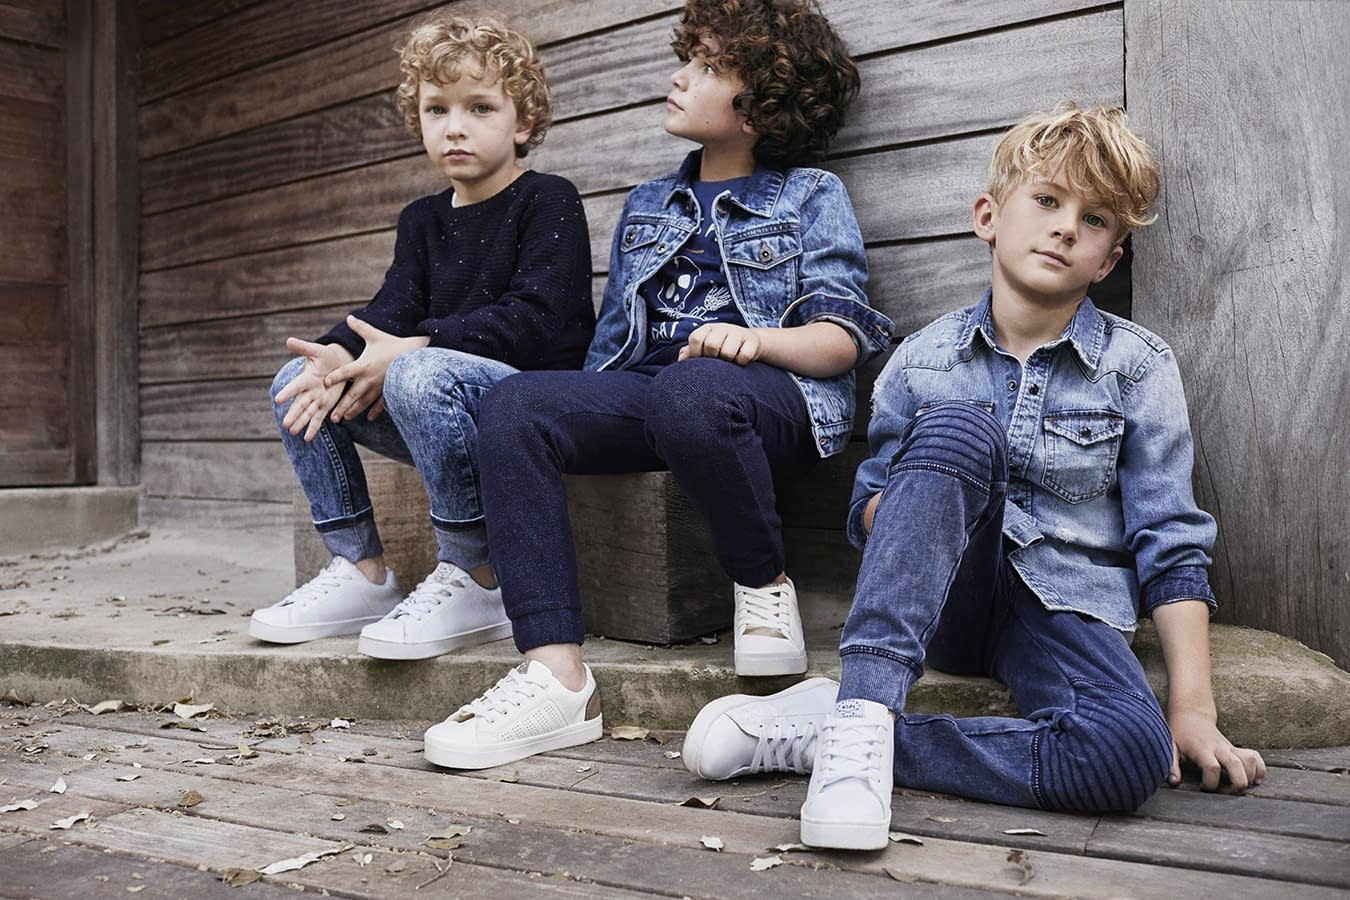 LEFTIES KIDS 3 PHOTO BY ENRIC GALCERAN